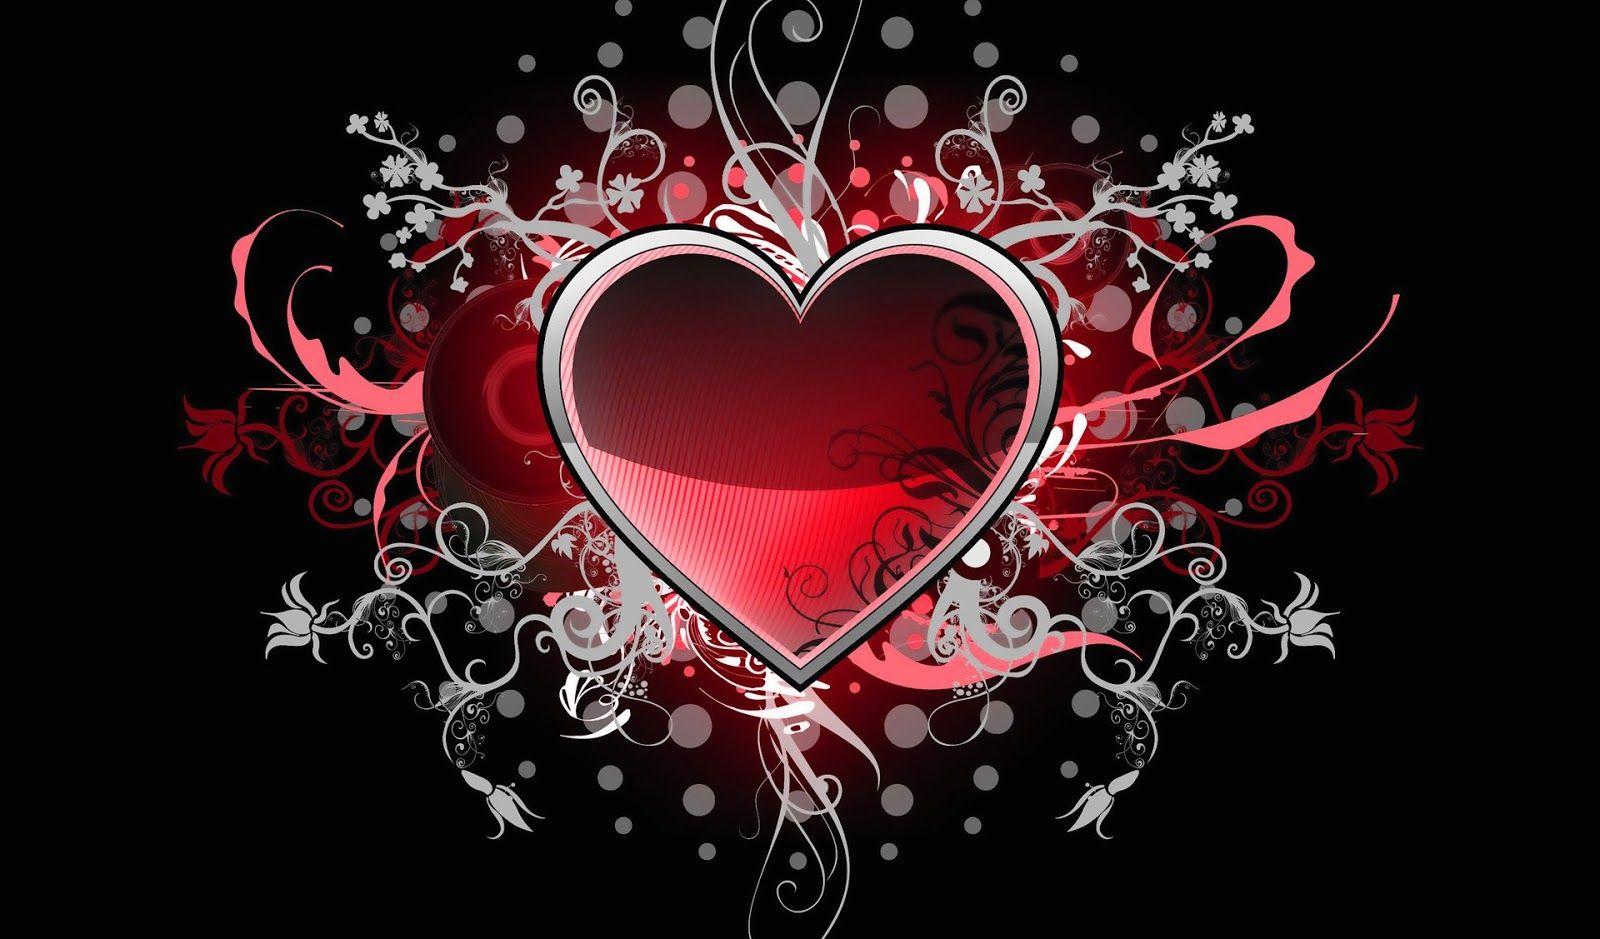 valentines day wallpaper Heart Valentine day wallpaper hd 1600x939